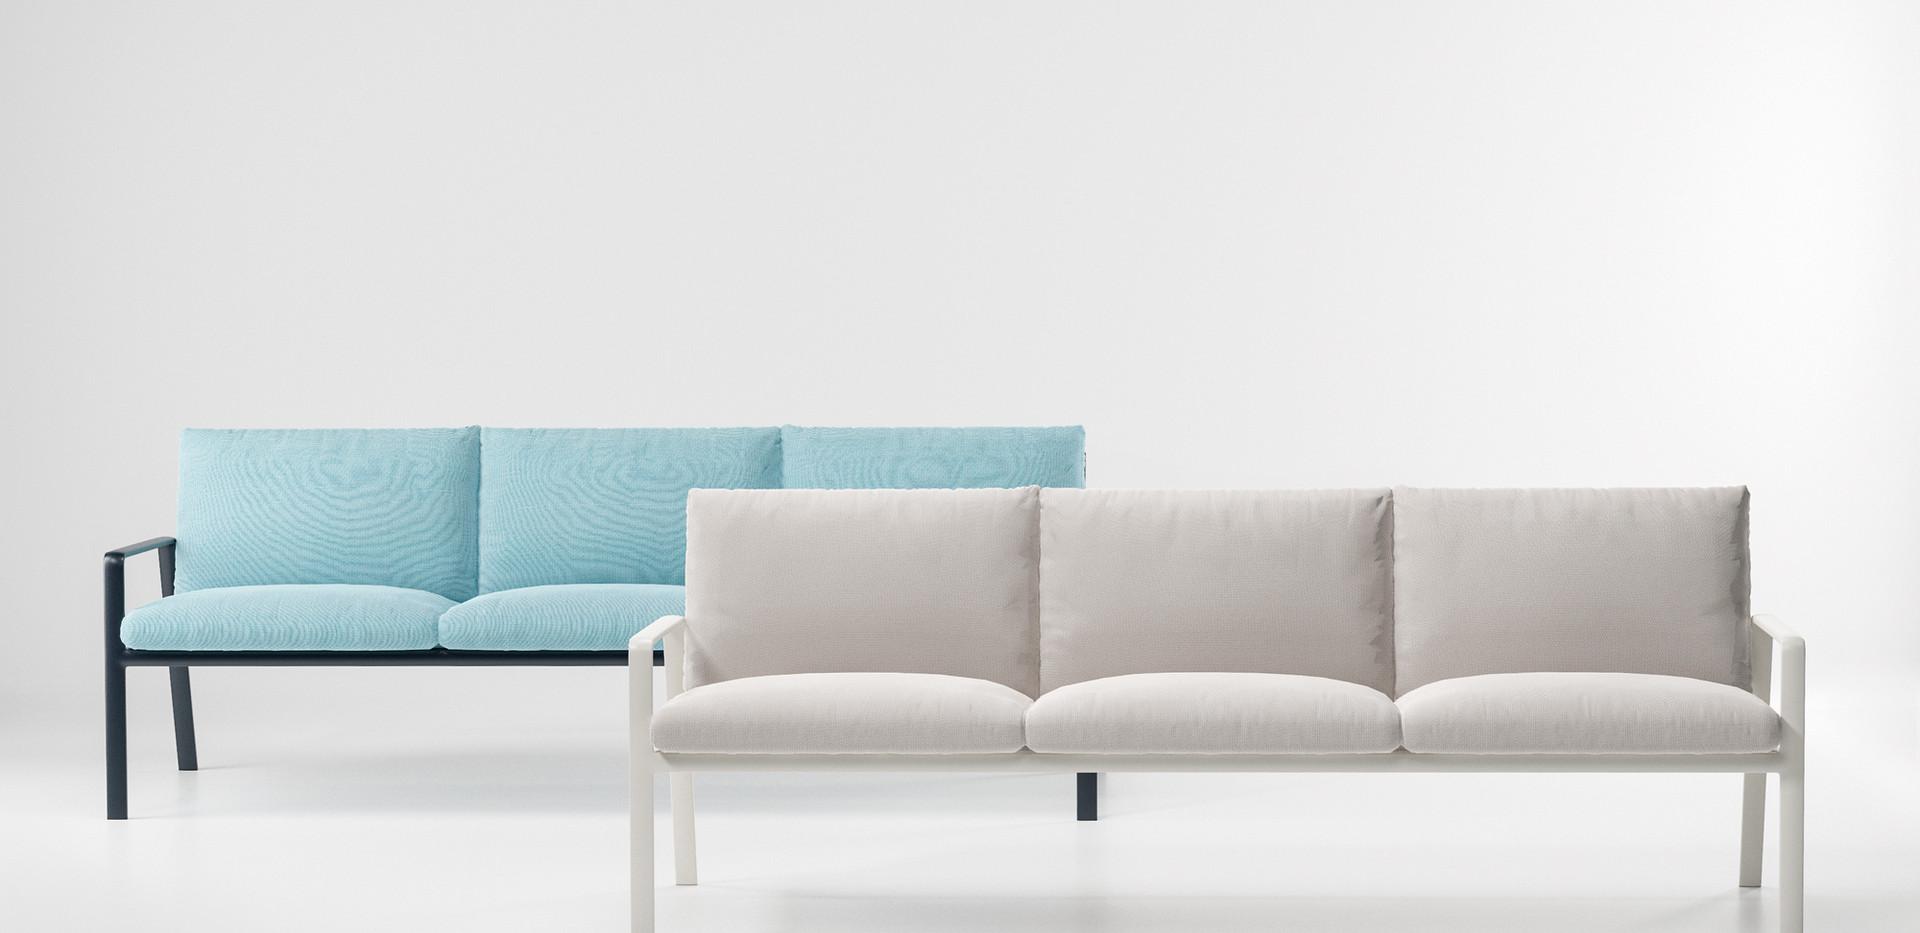 Kettal Park Life 3 seater sofa